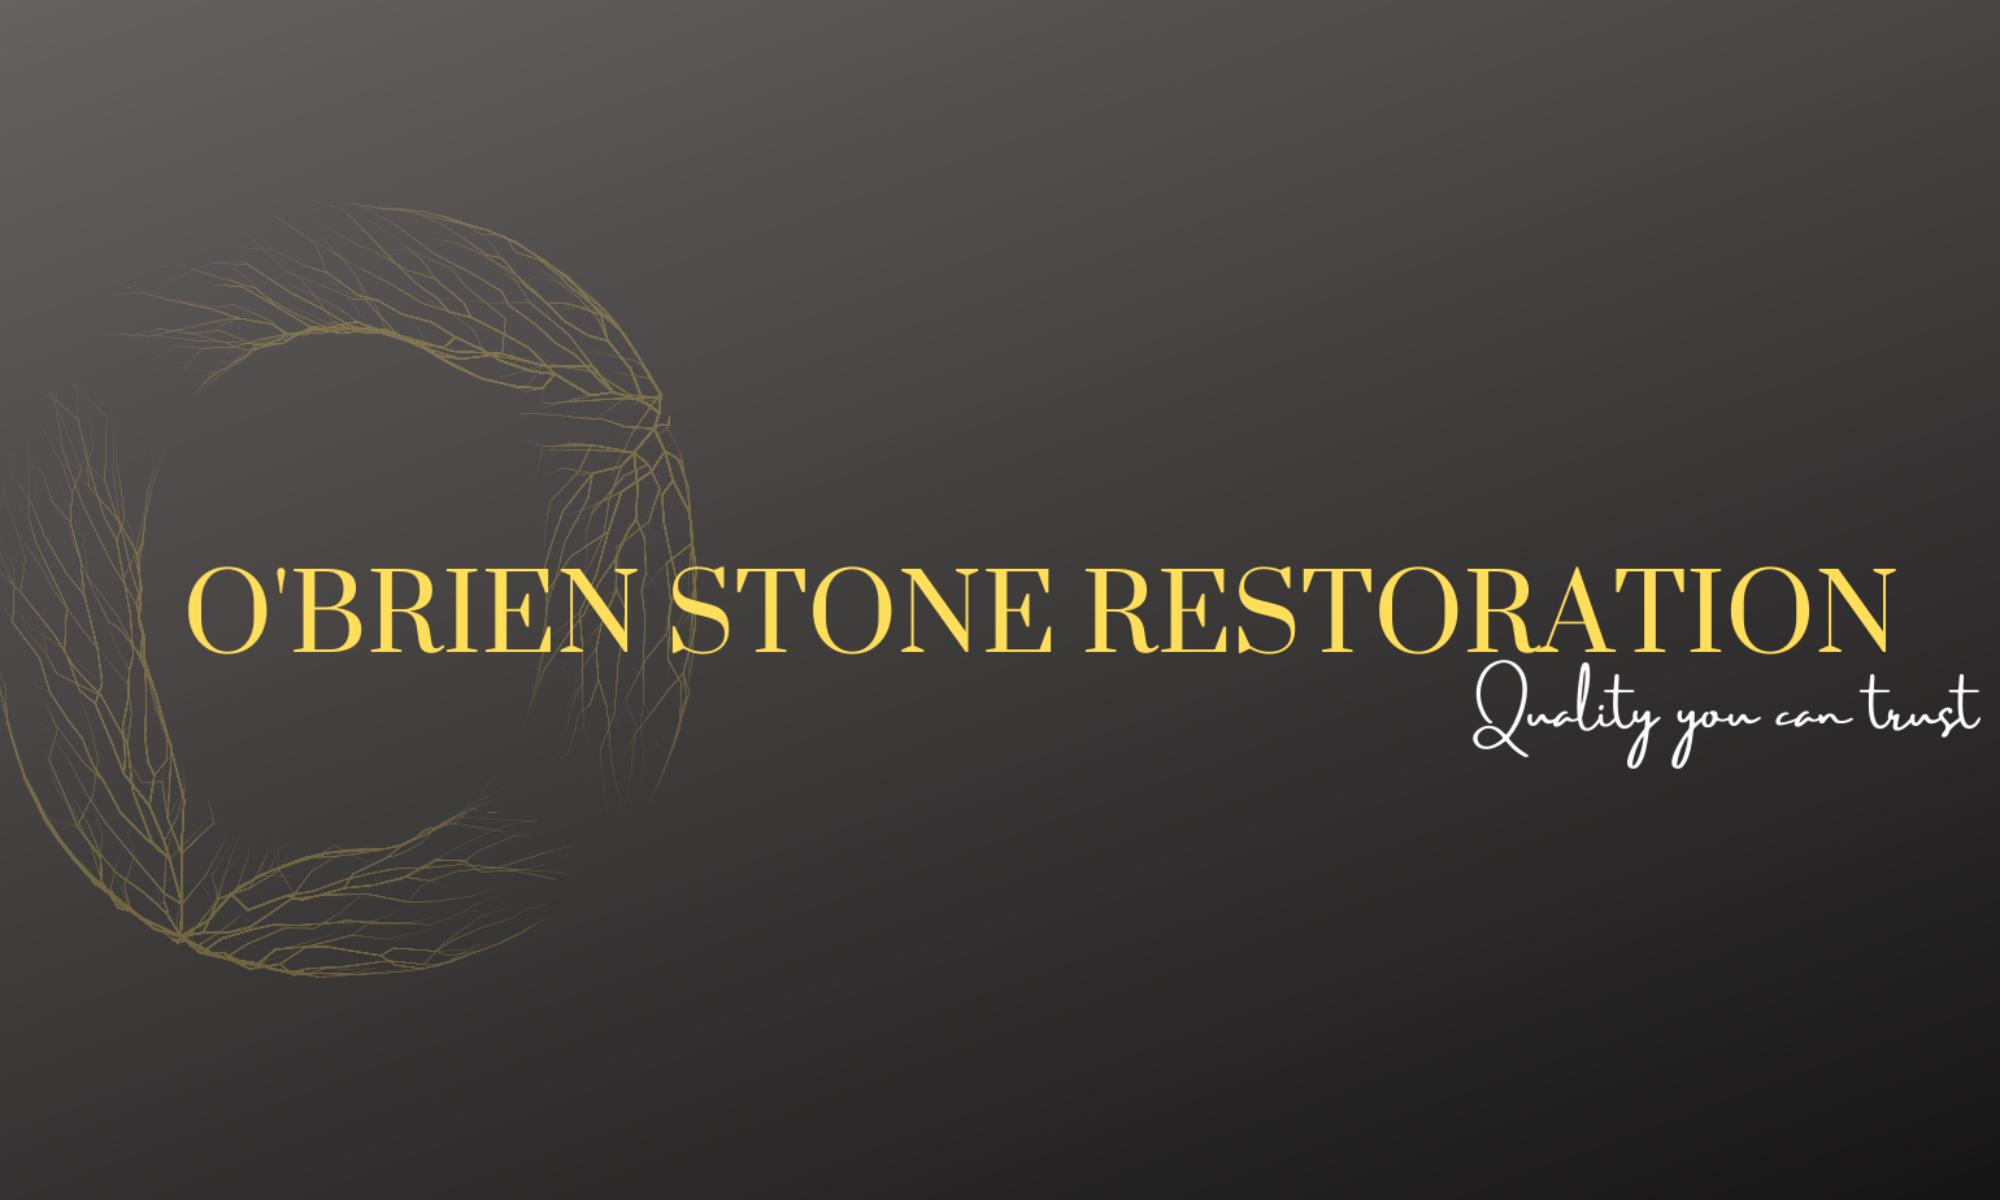 O'Brien Stone Restoration